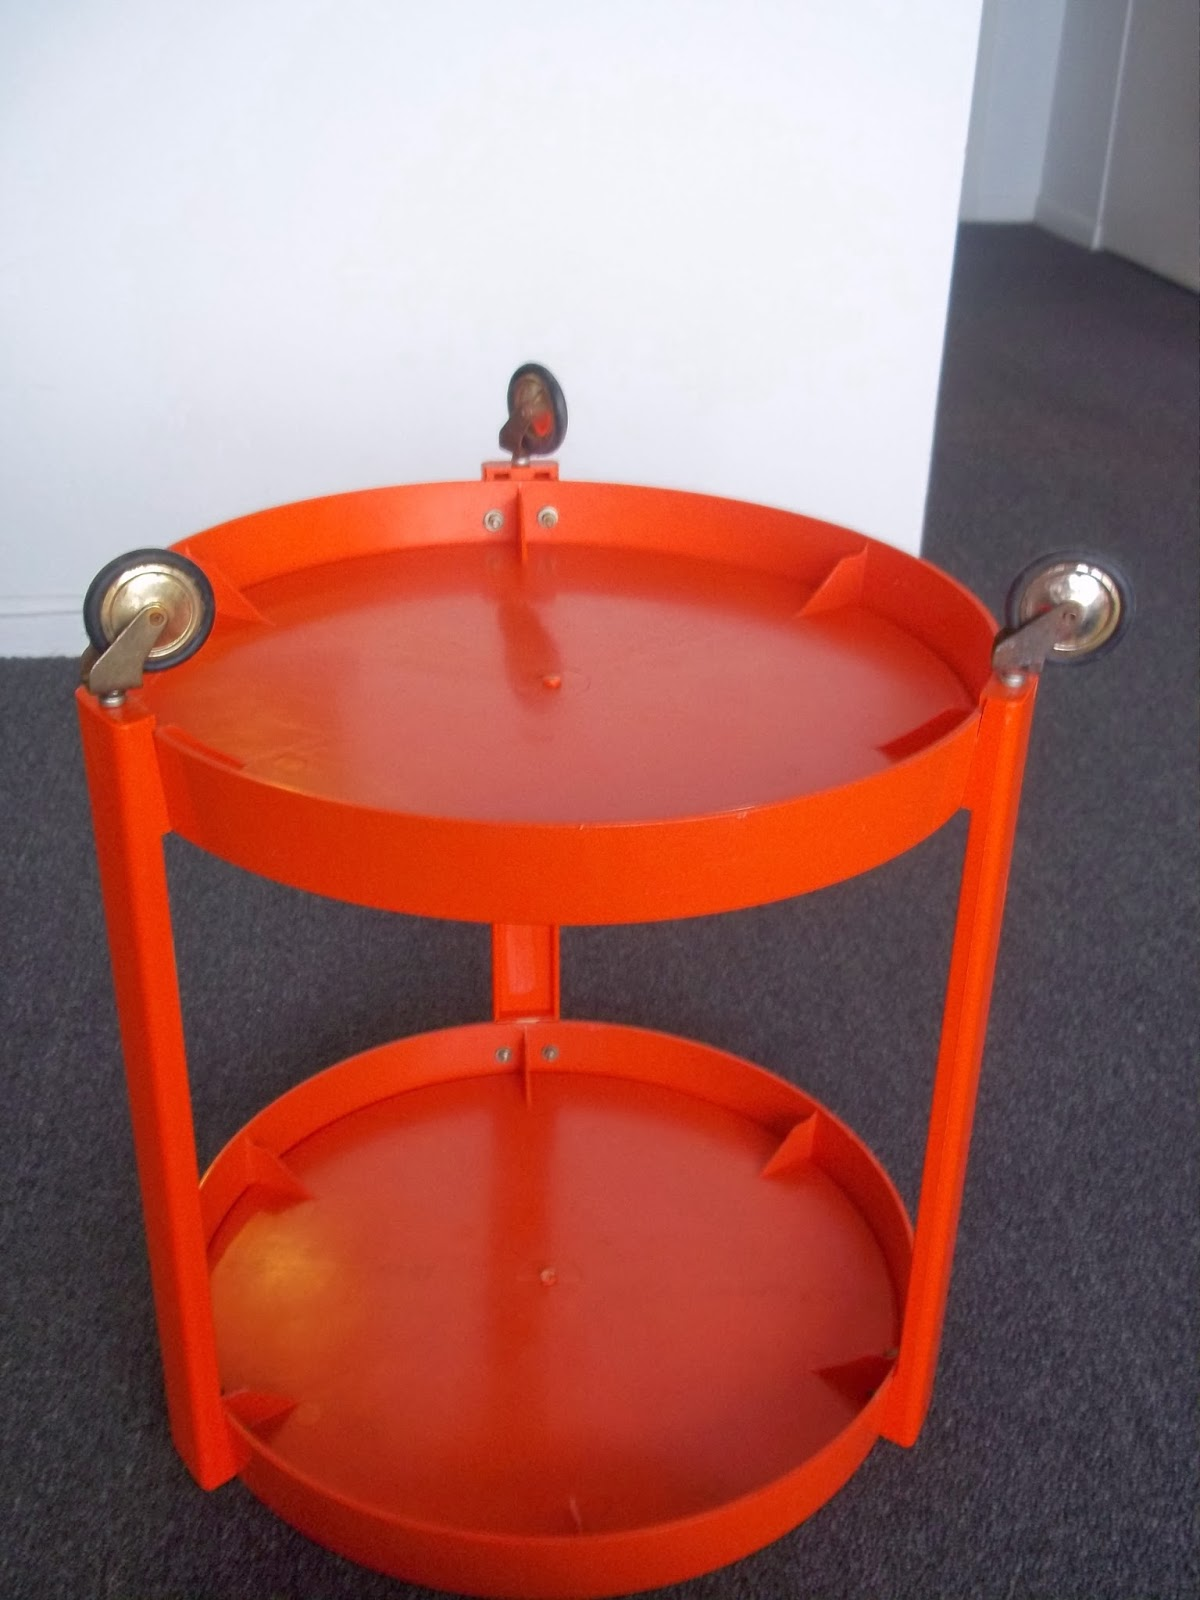 modern20 vintage 1960 39 s orange plastic trolley table mid century modern kartell panton era made. Black Bedroom Furniture Sets. Home Design Ideas